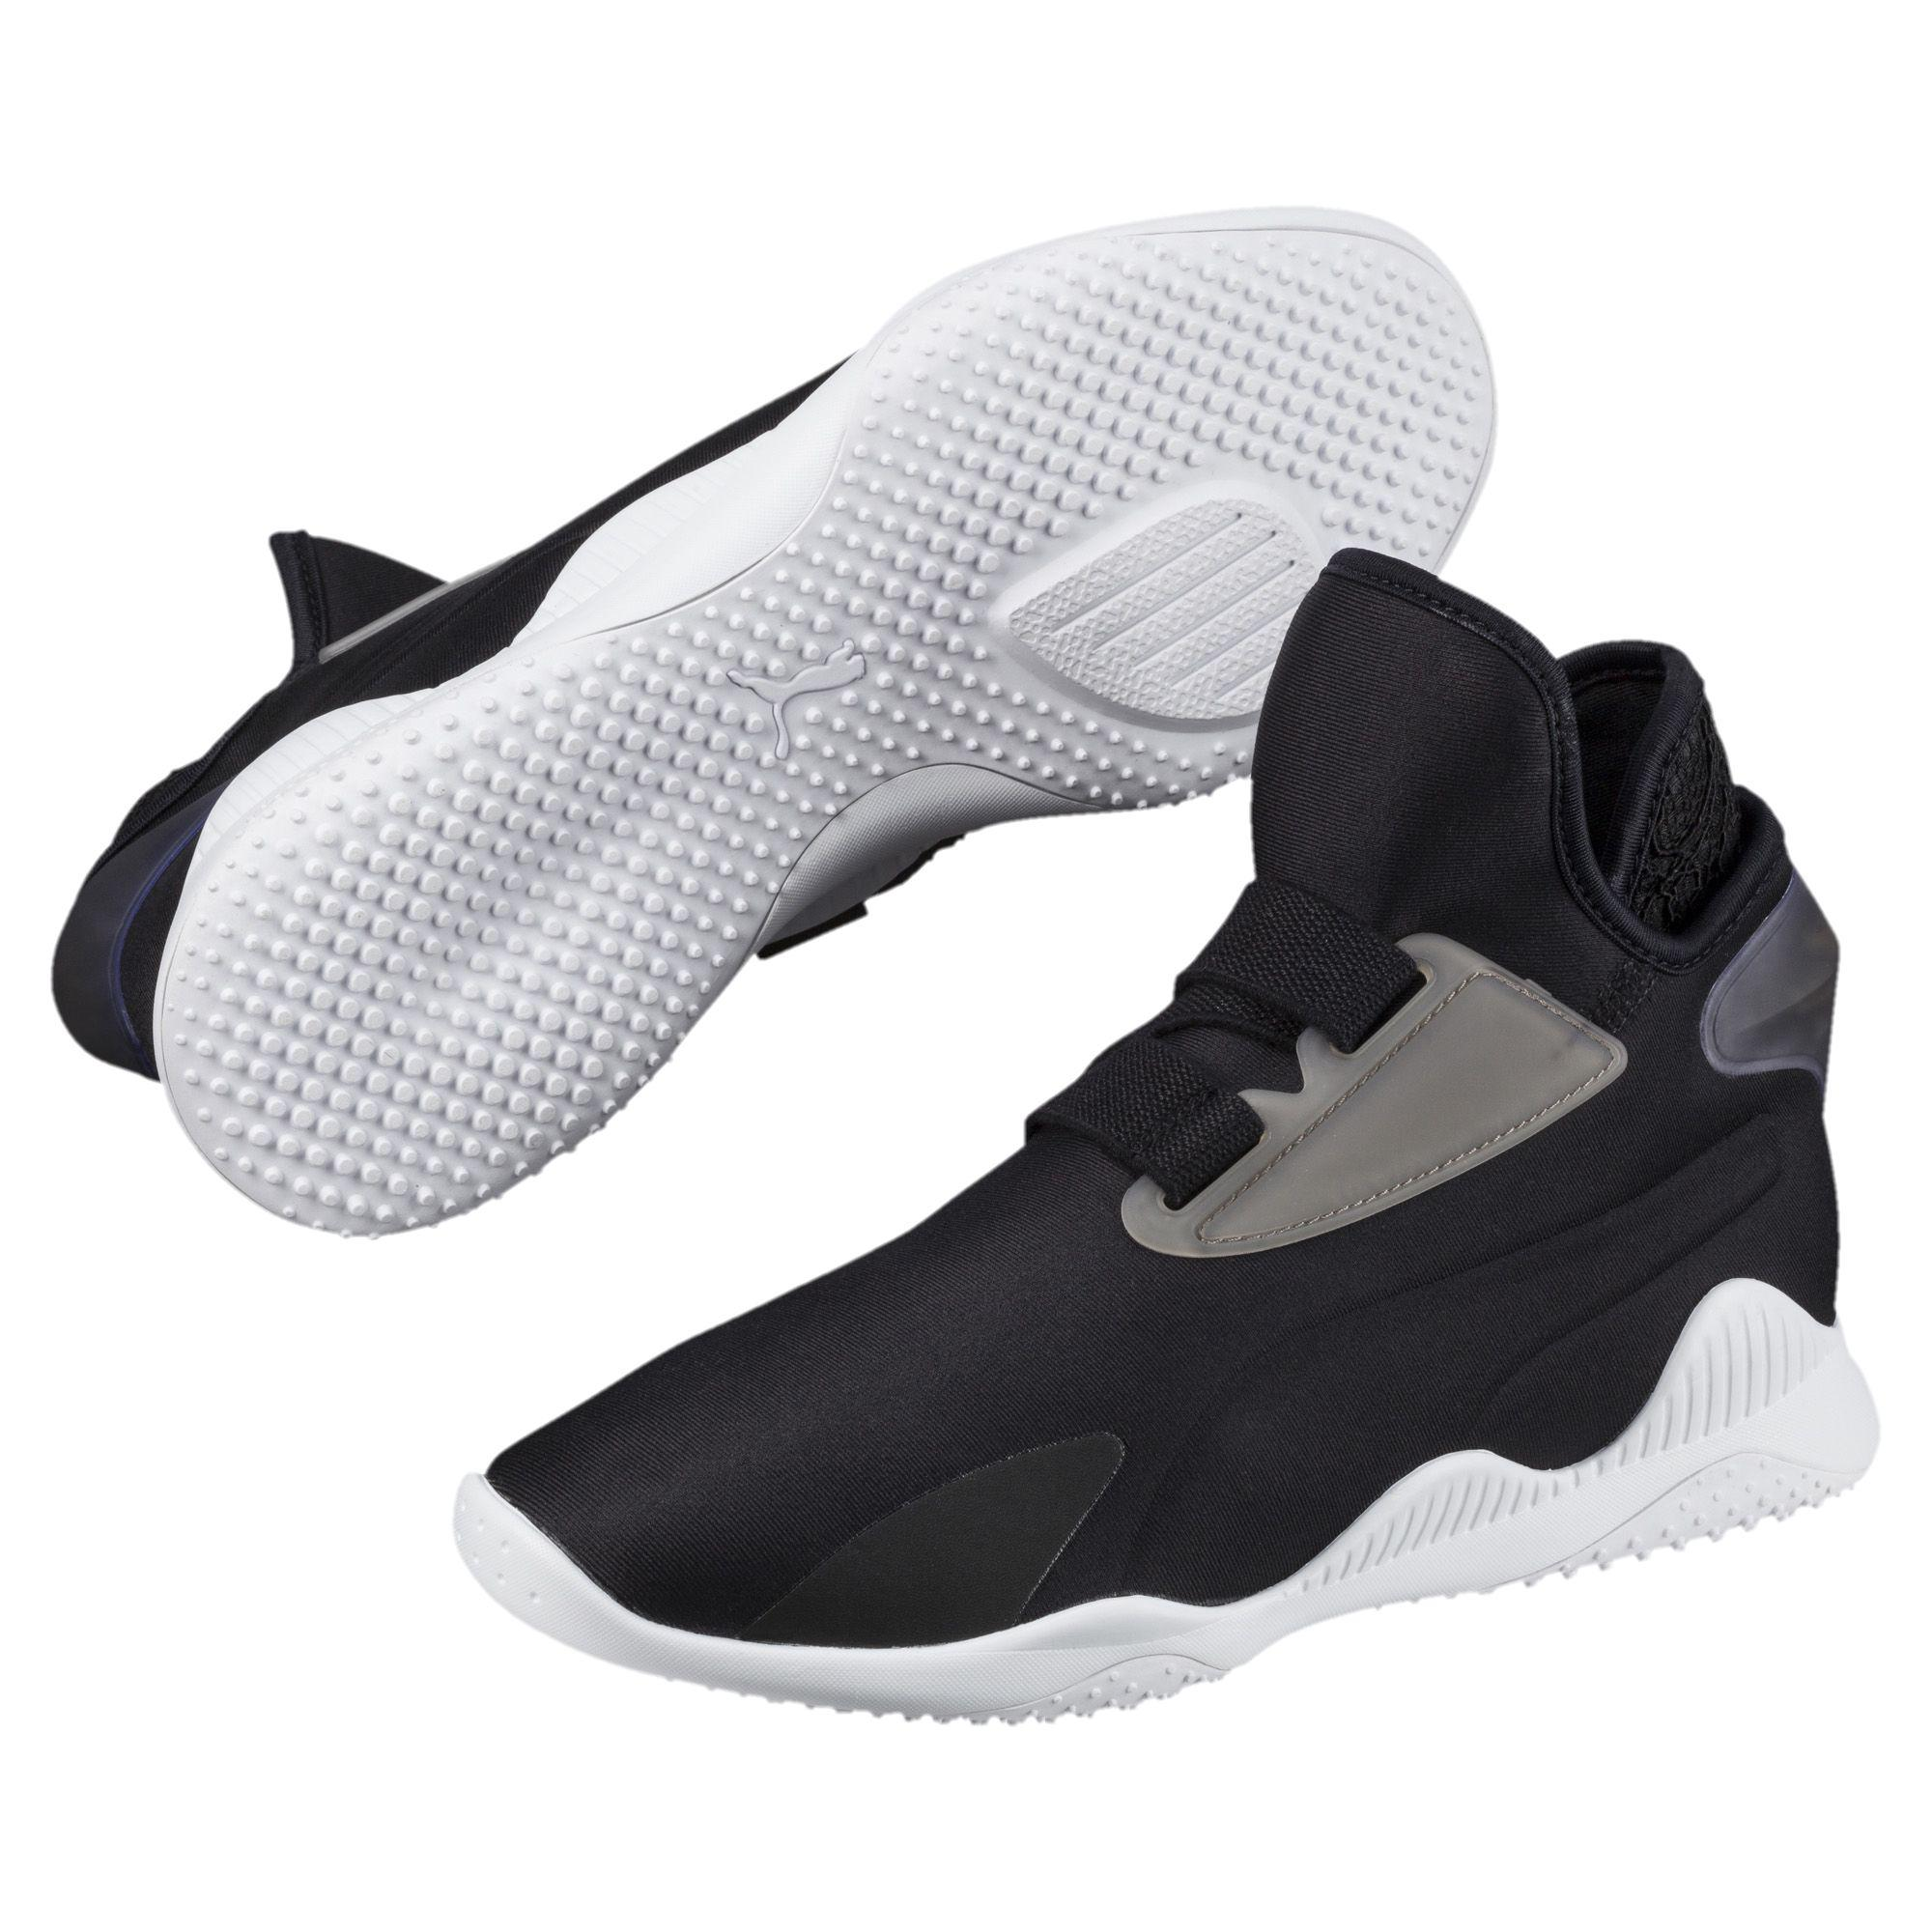 35bb7e7654820b Lyst - PUMA Mostro Śīrsa Fo Women s Boots in Black